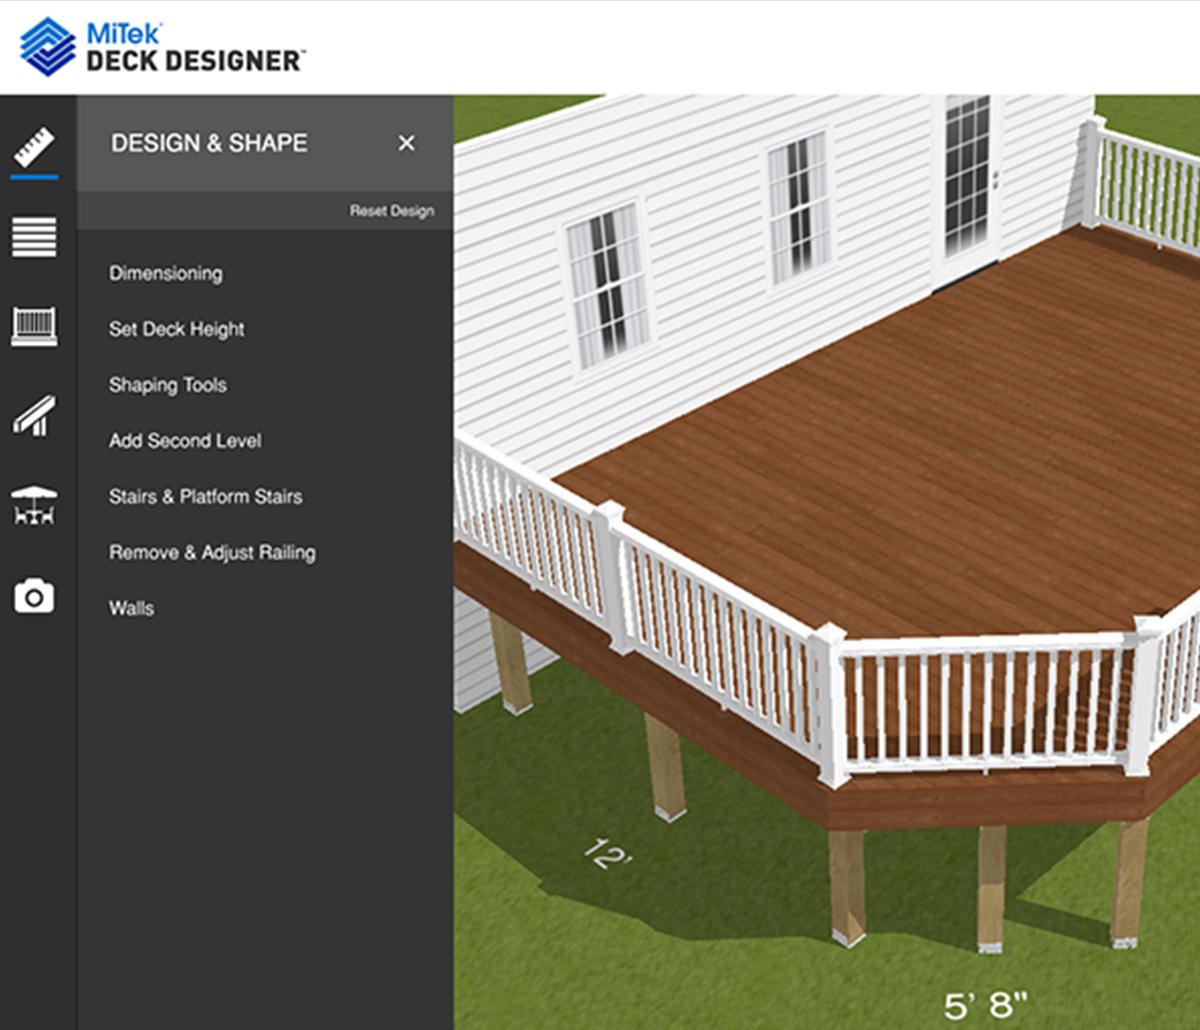 MiTek Deck Designer Software - Screenshot of Deck Designer software